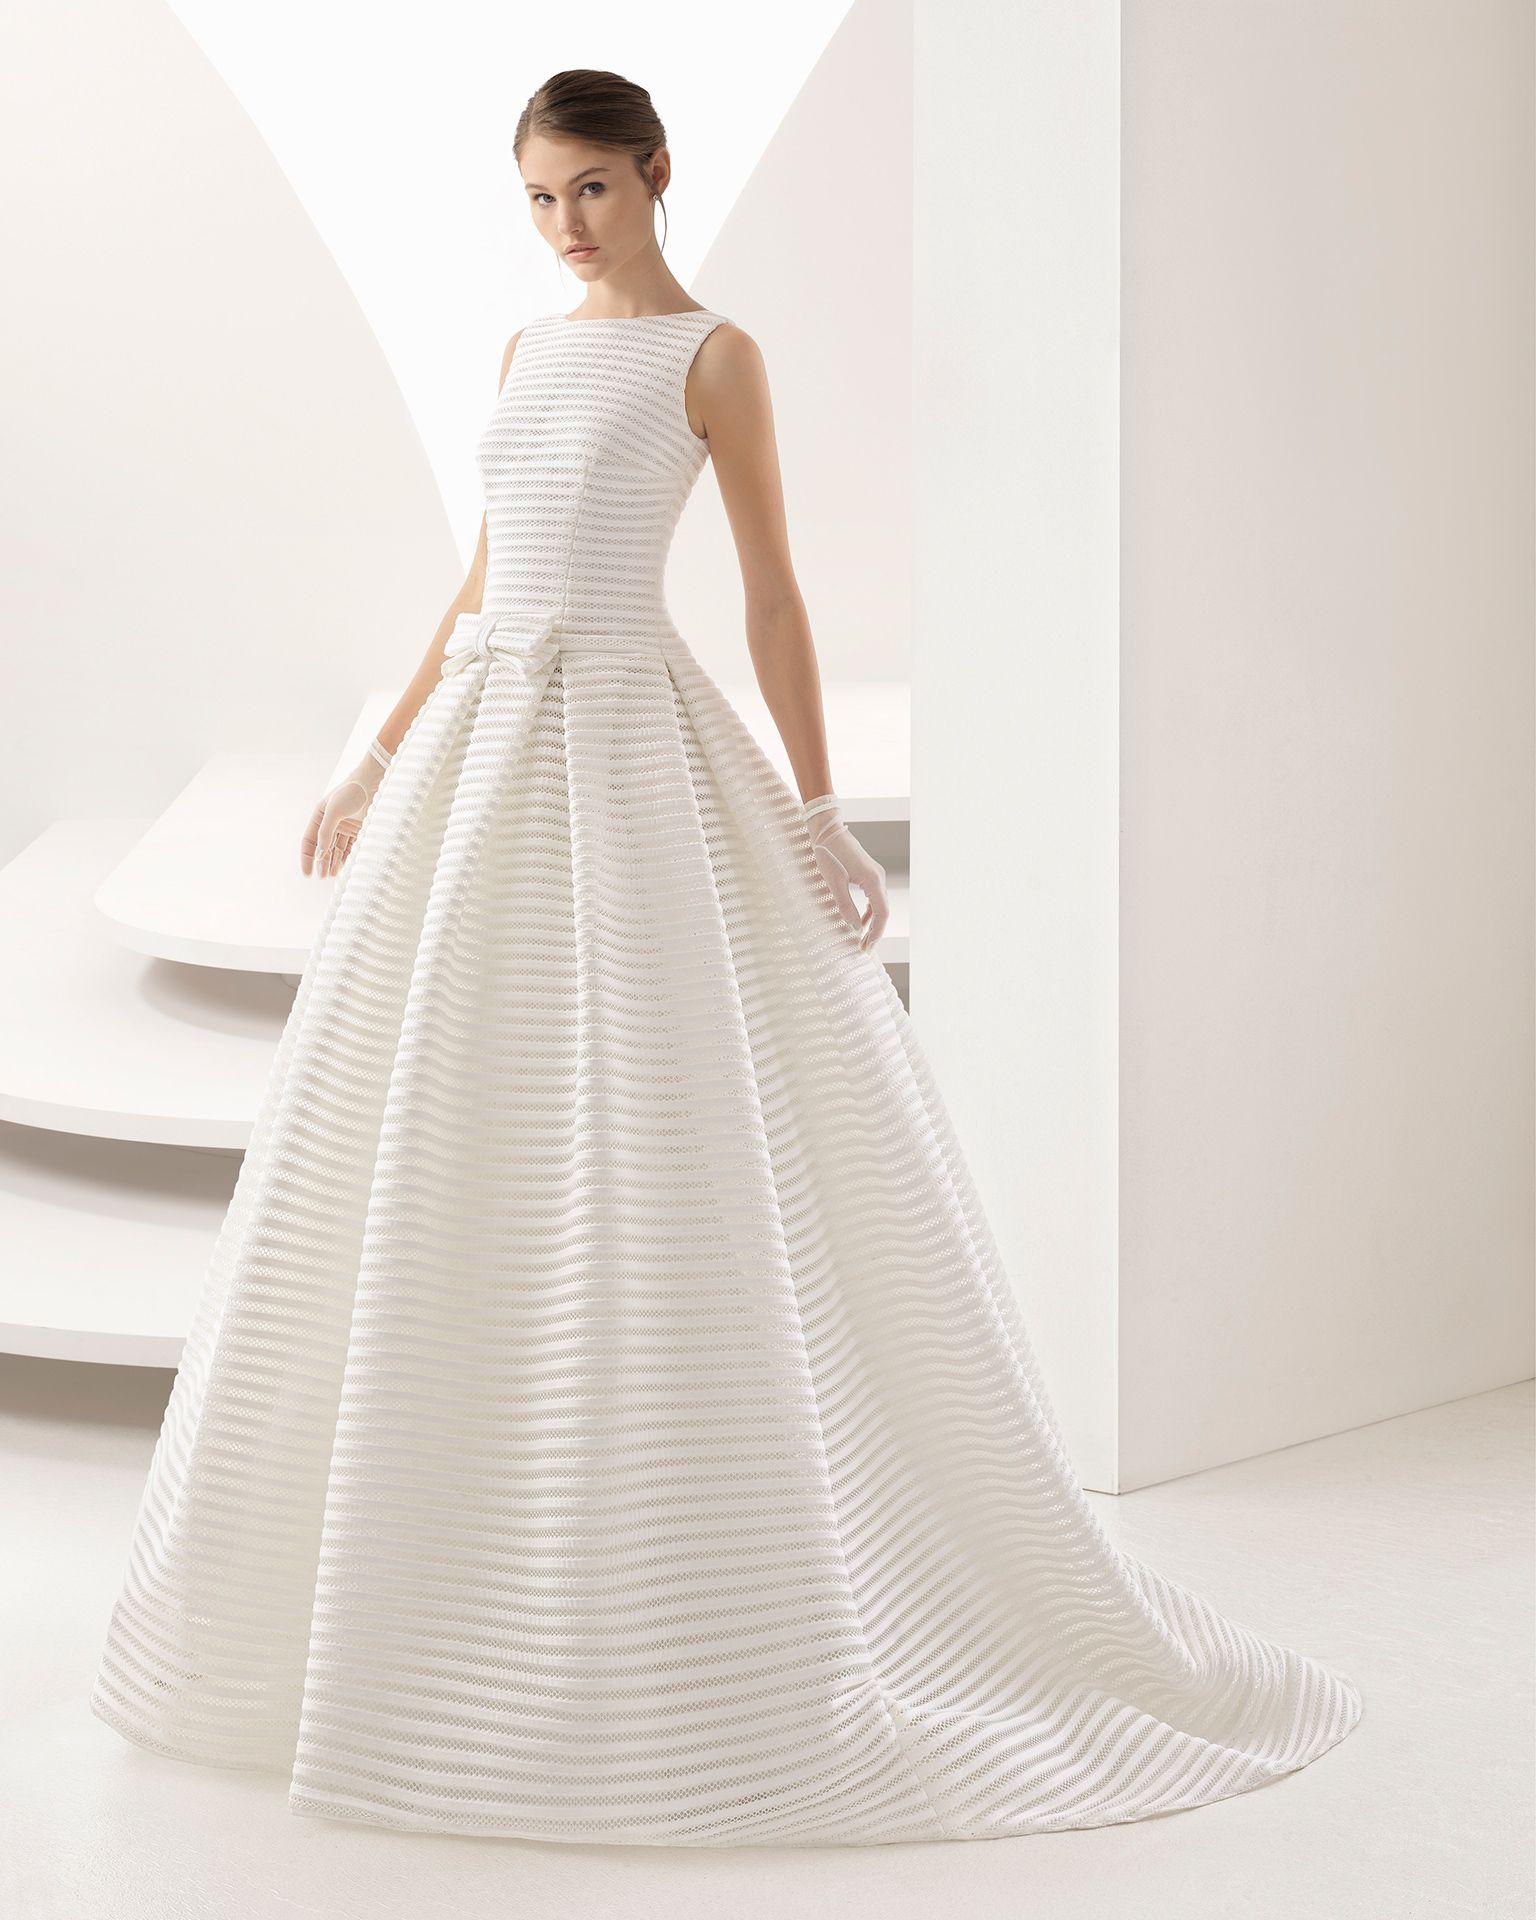 ONEIDA - Hochzeit 2018. Rosa Clará Kollektion | Wedding dress ...